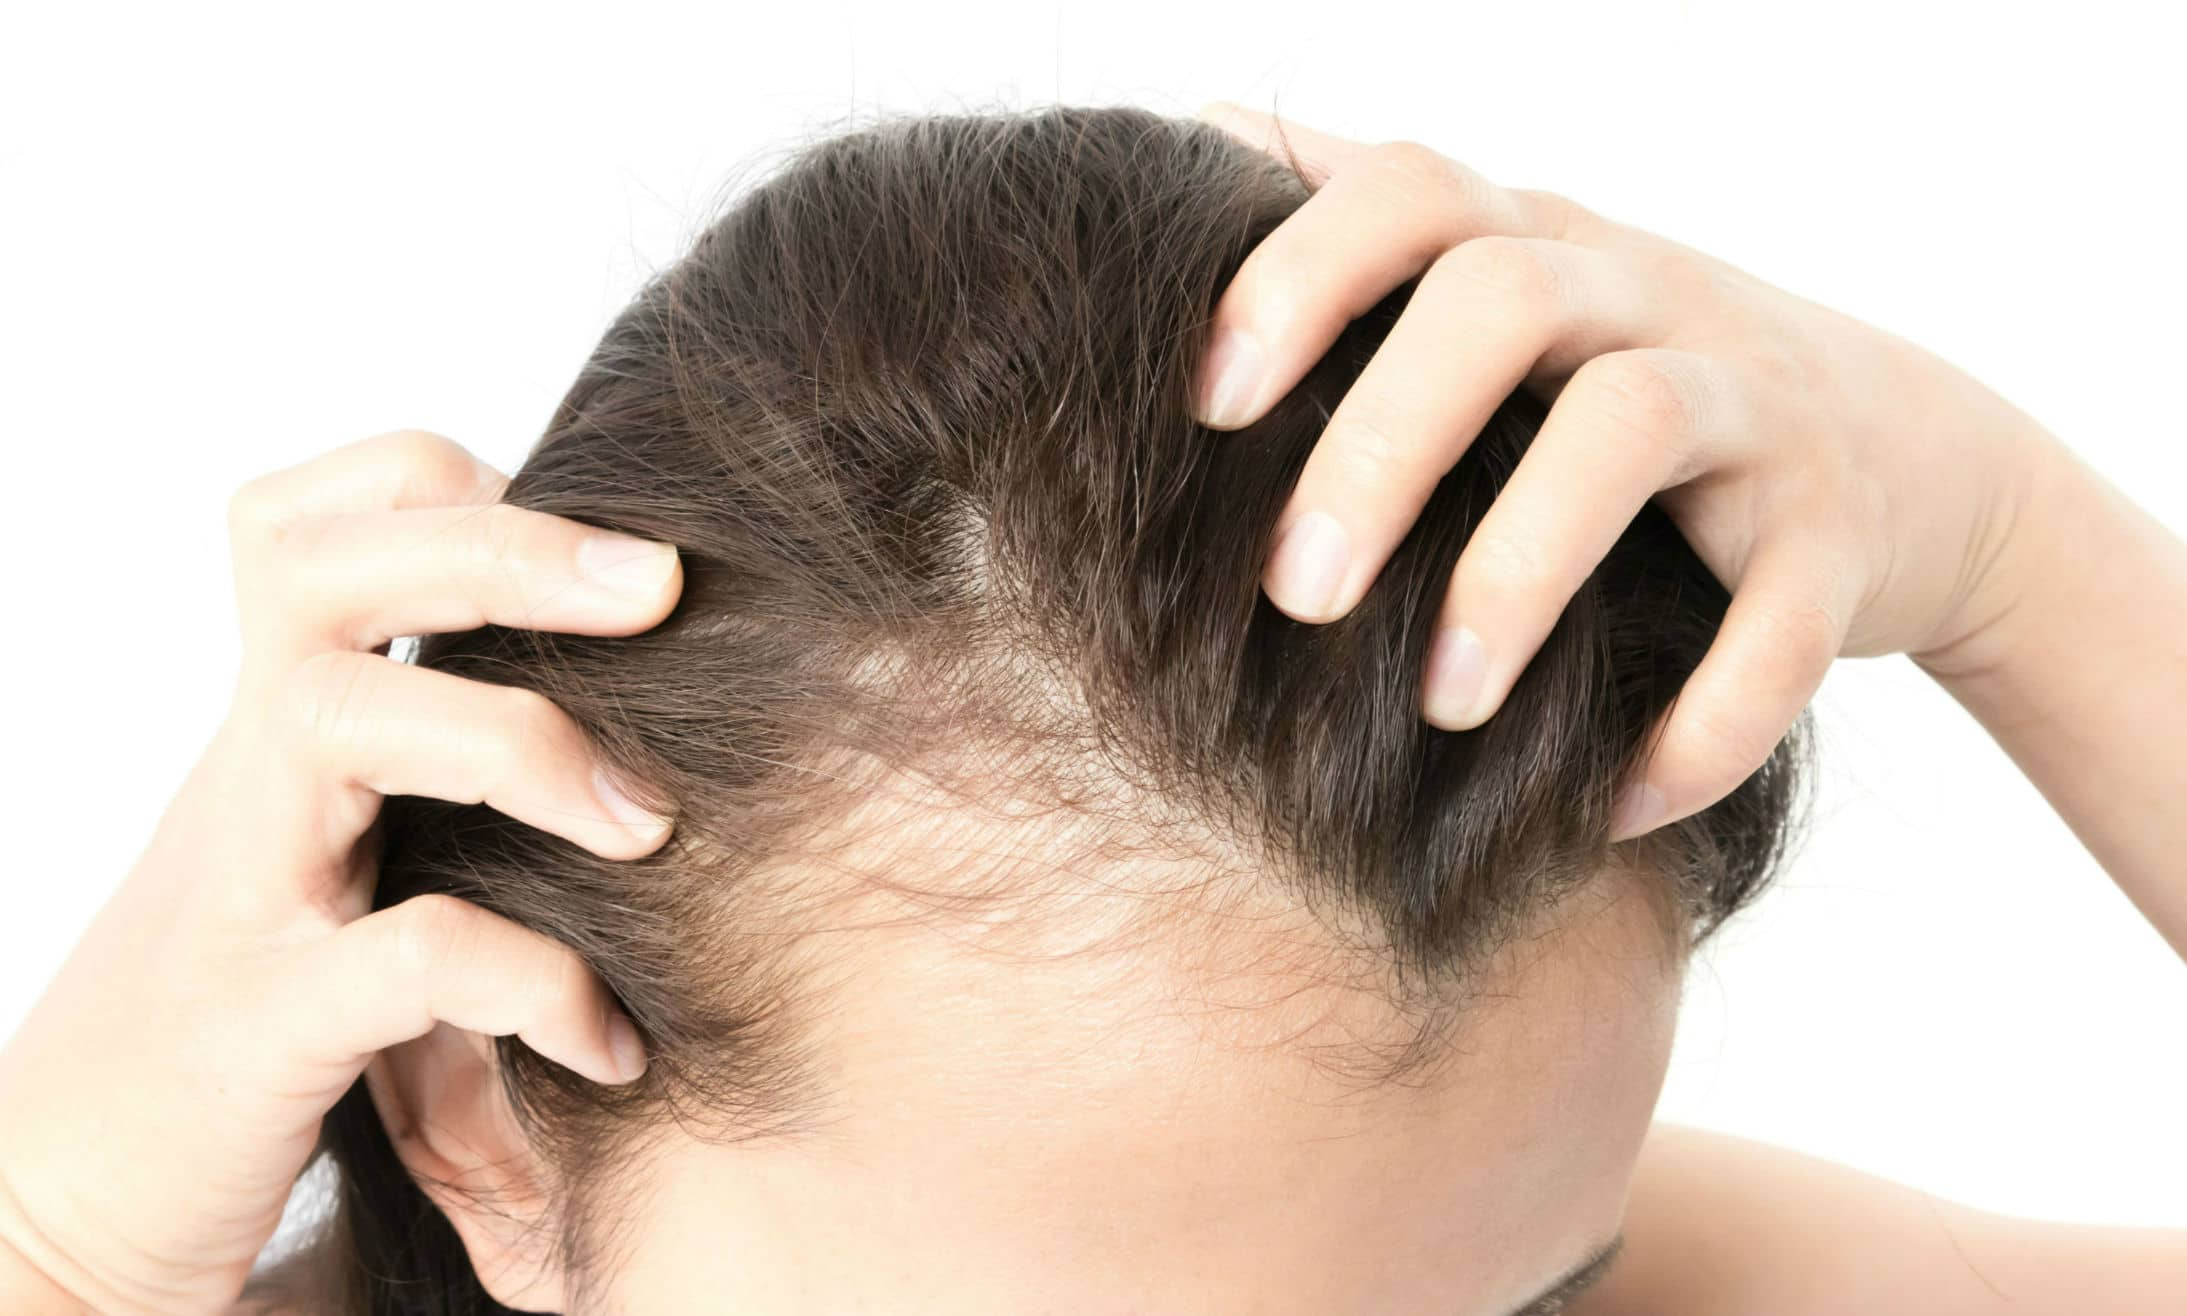 Hair Transplants For Women - Best Female Procedures by Surgeons